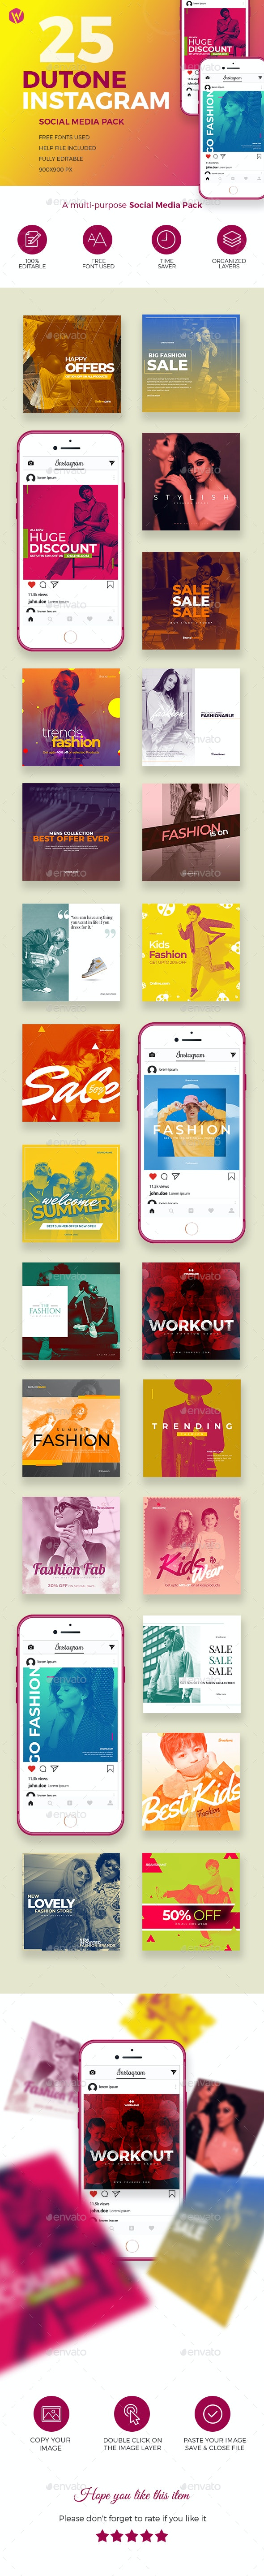 25 Dutone Instagram - Multi-Purpose Social Media Pack - Social Media Web Elements